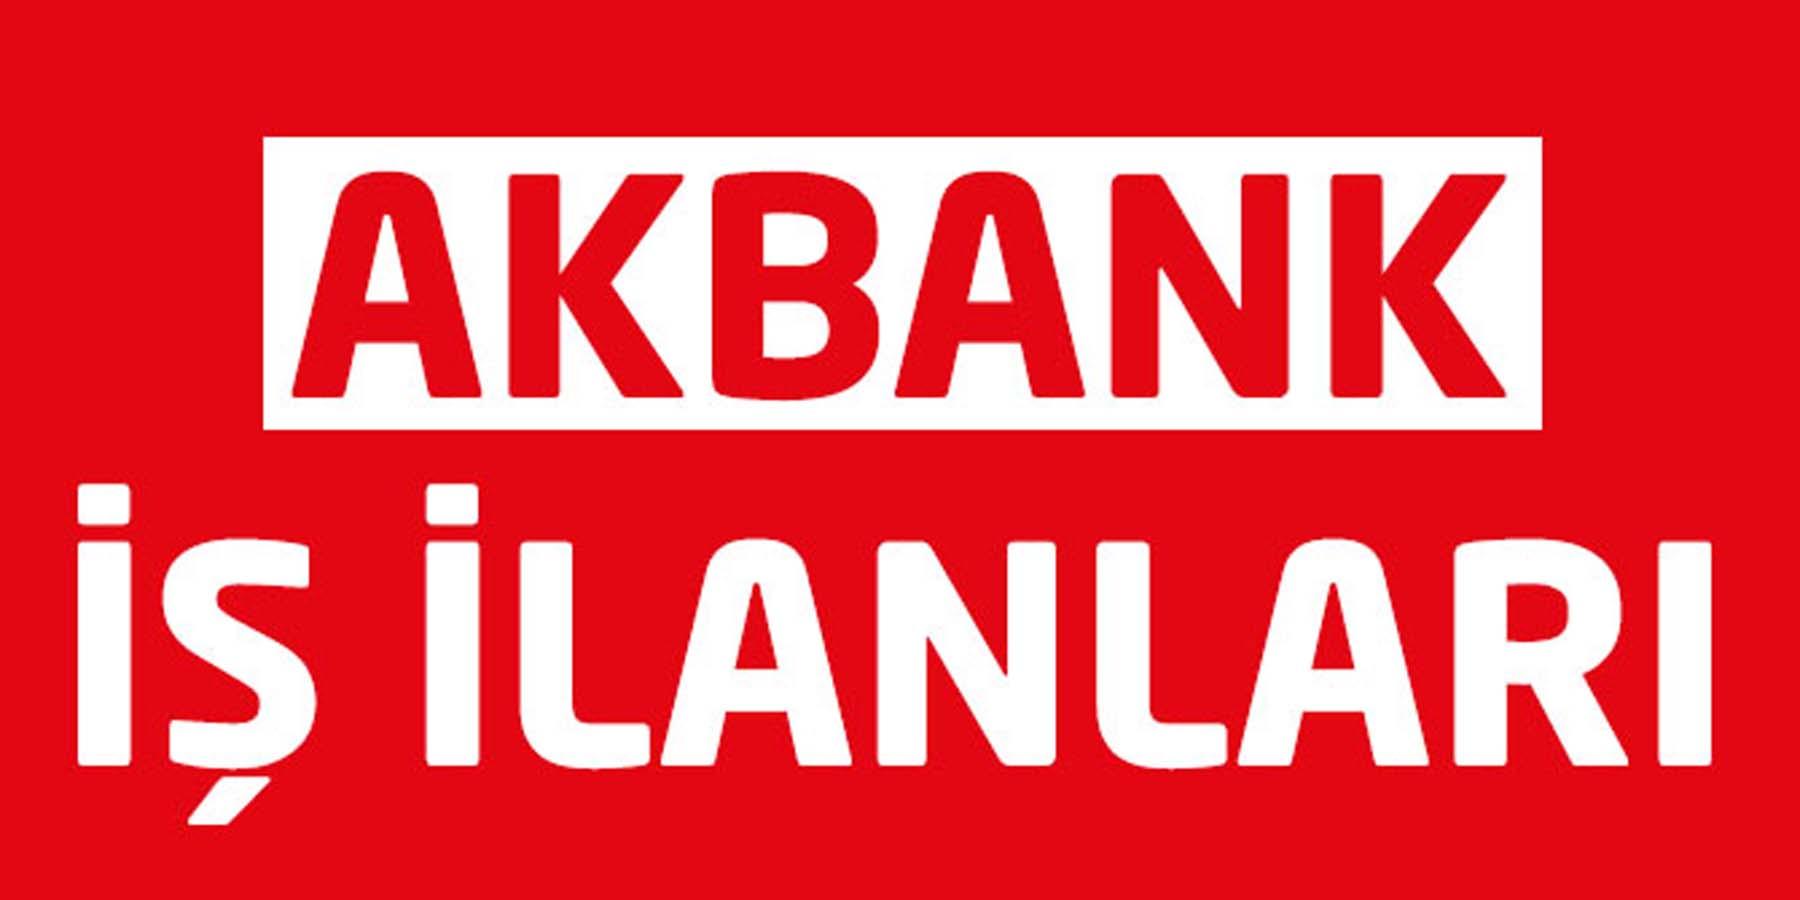 Akbank İş İlanları Mayıs 2018